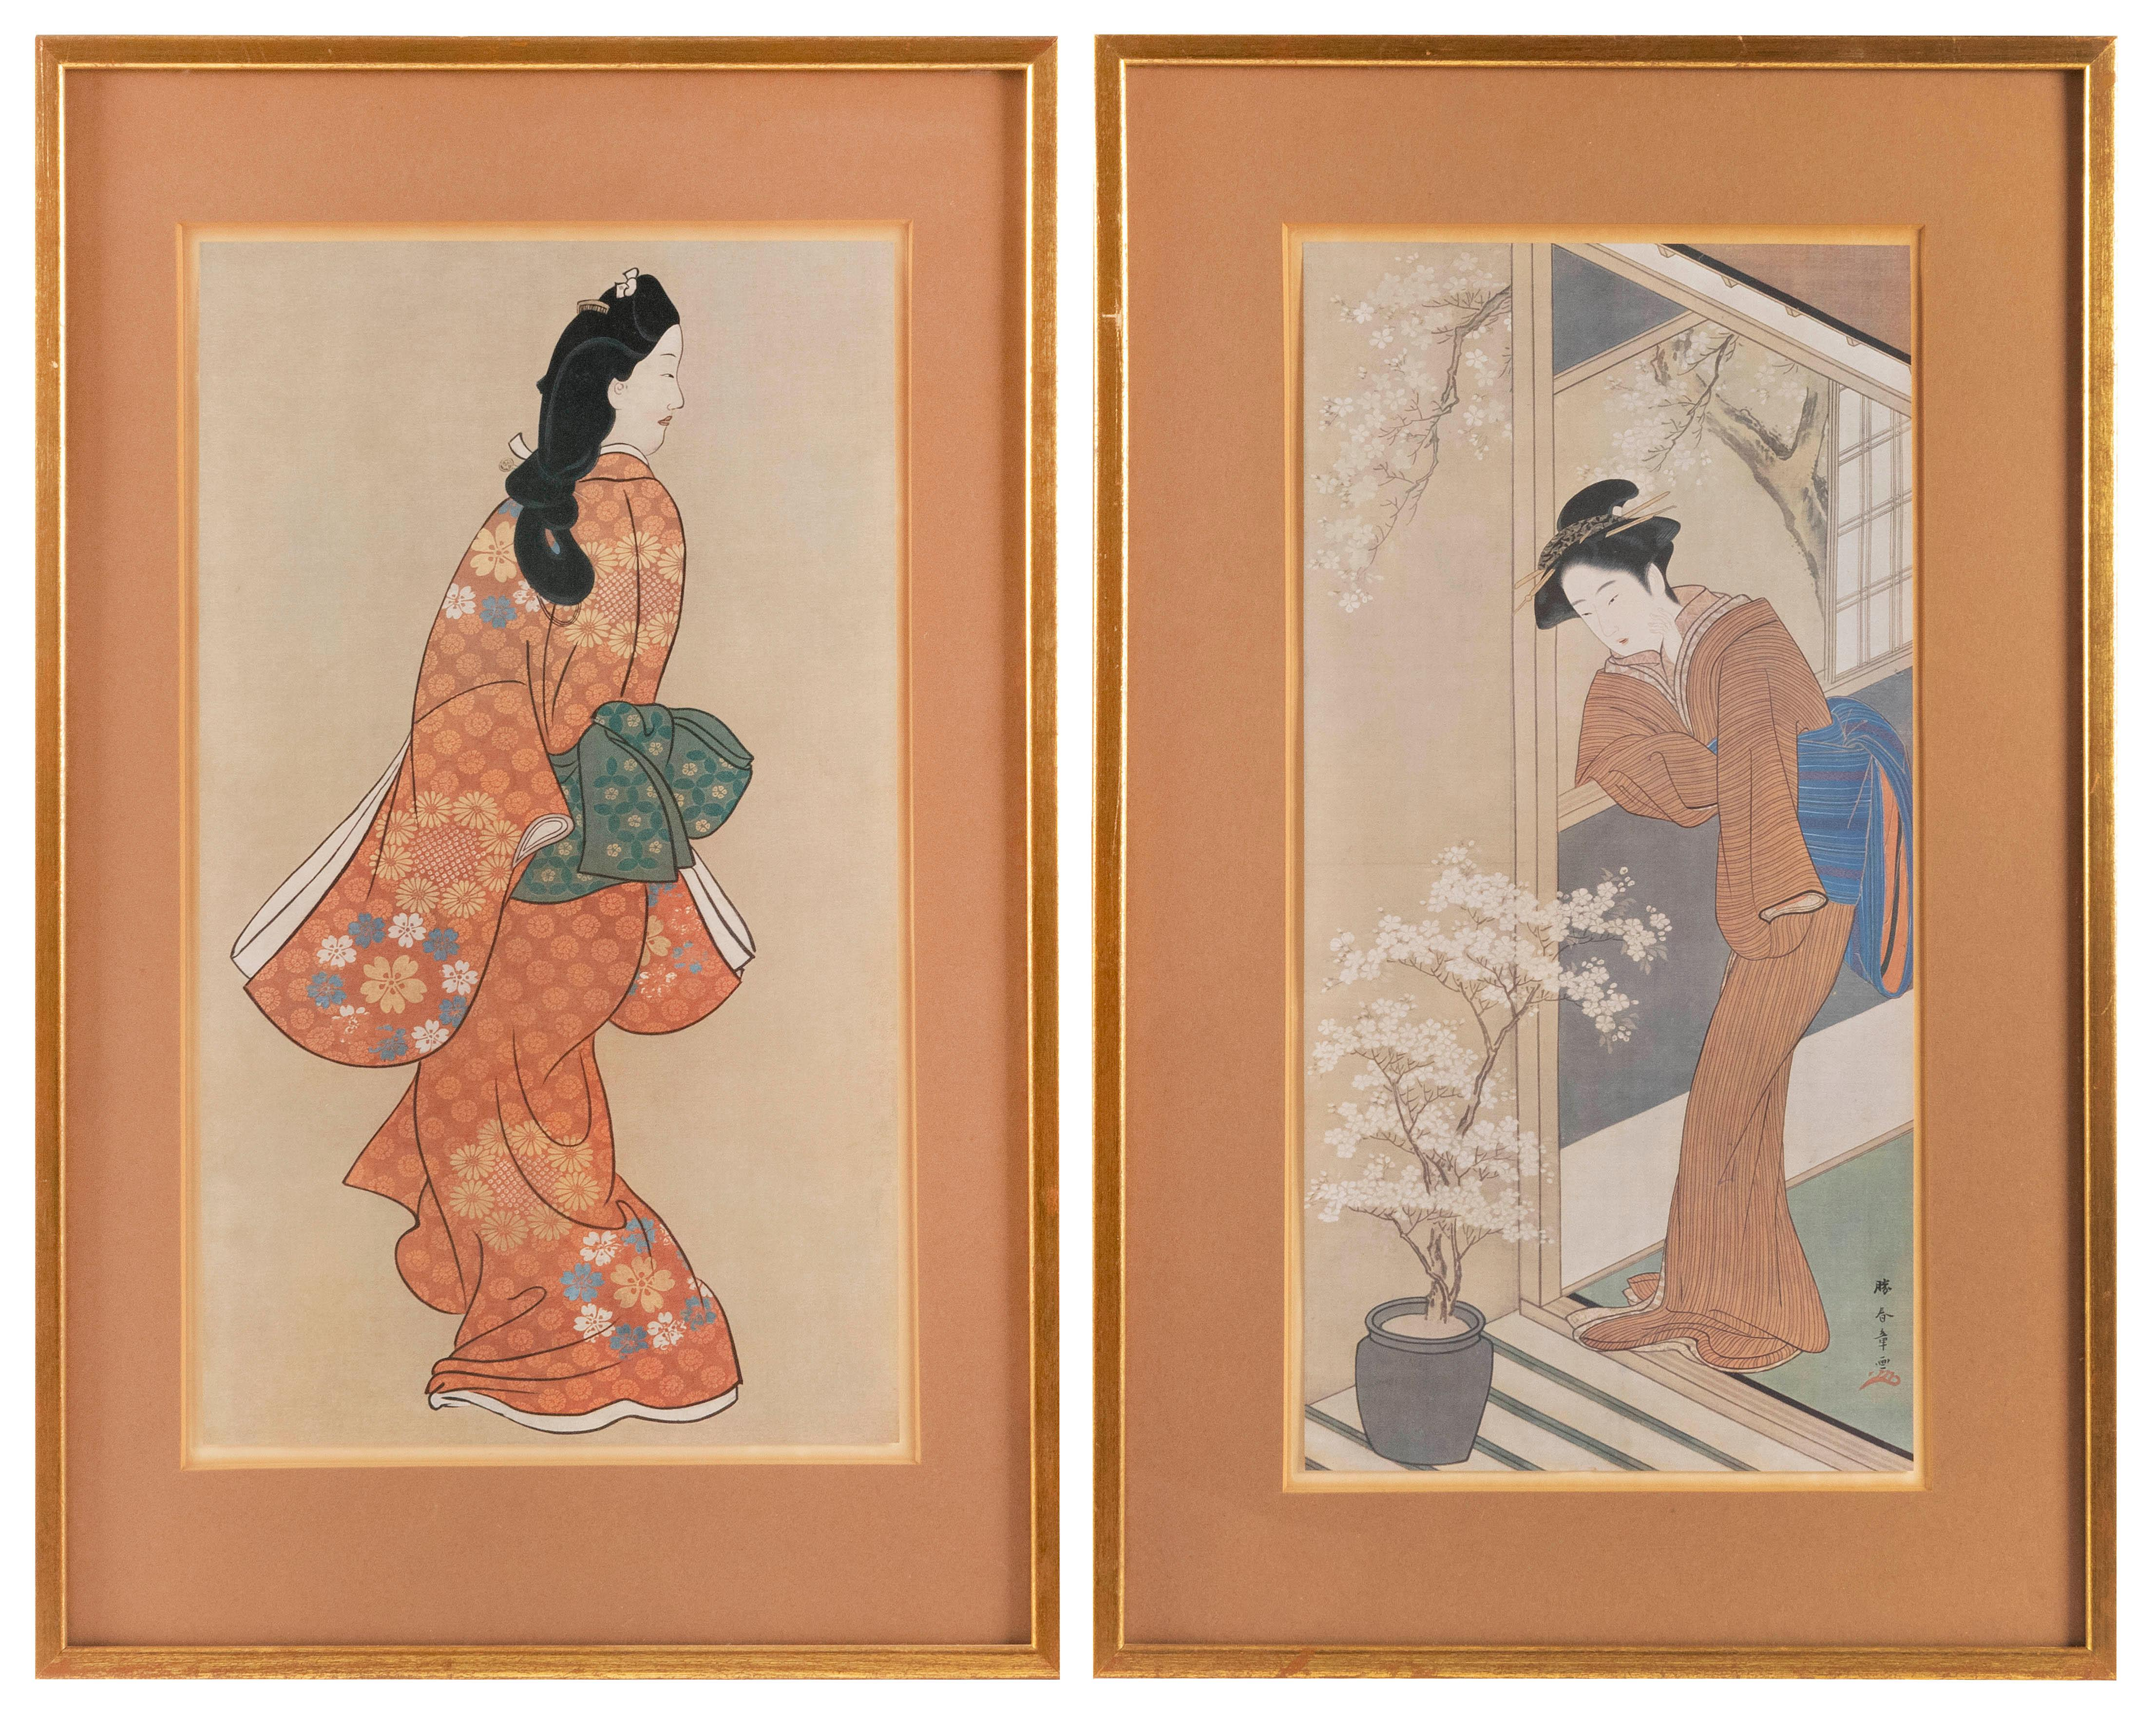 "TWO WOODBLOCK PRINTS 1) ""Beauty Looking Back"" by Hishikawa Moronobu. 2) From ""Women in Seasons of Snow, Moon, and Flower"" by Katsuka..."